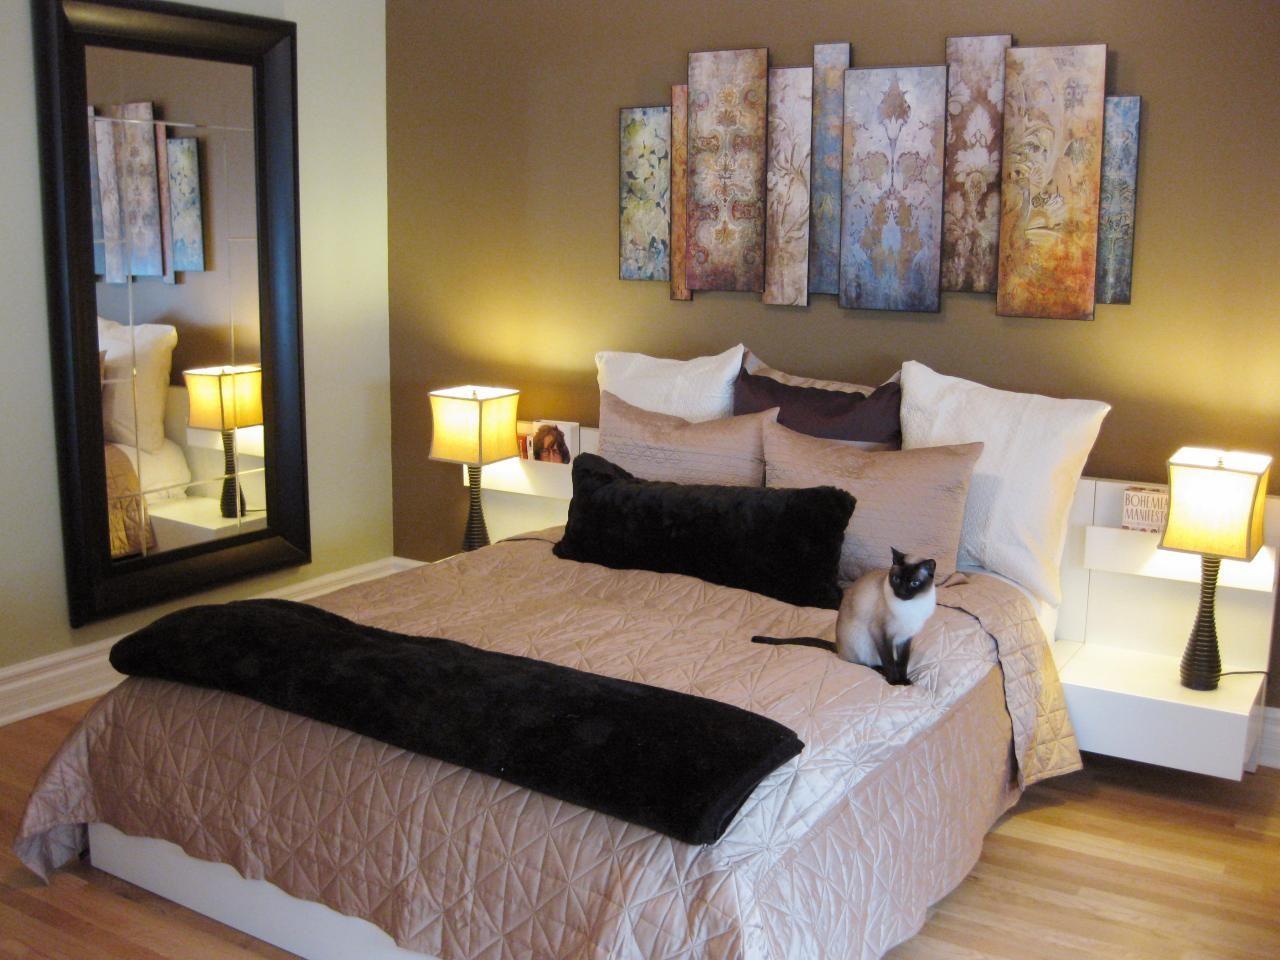 45 Exemples De T Te De Lit Originale En Styles Diff Rents ~ Decoracion Dormitorios Matrimoniales